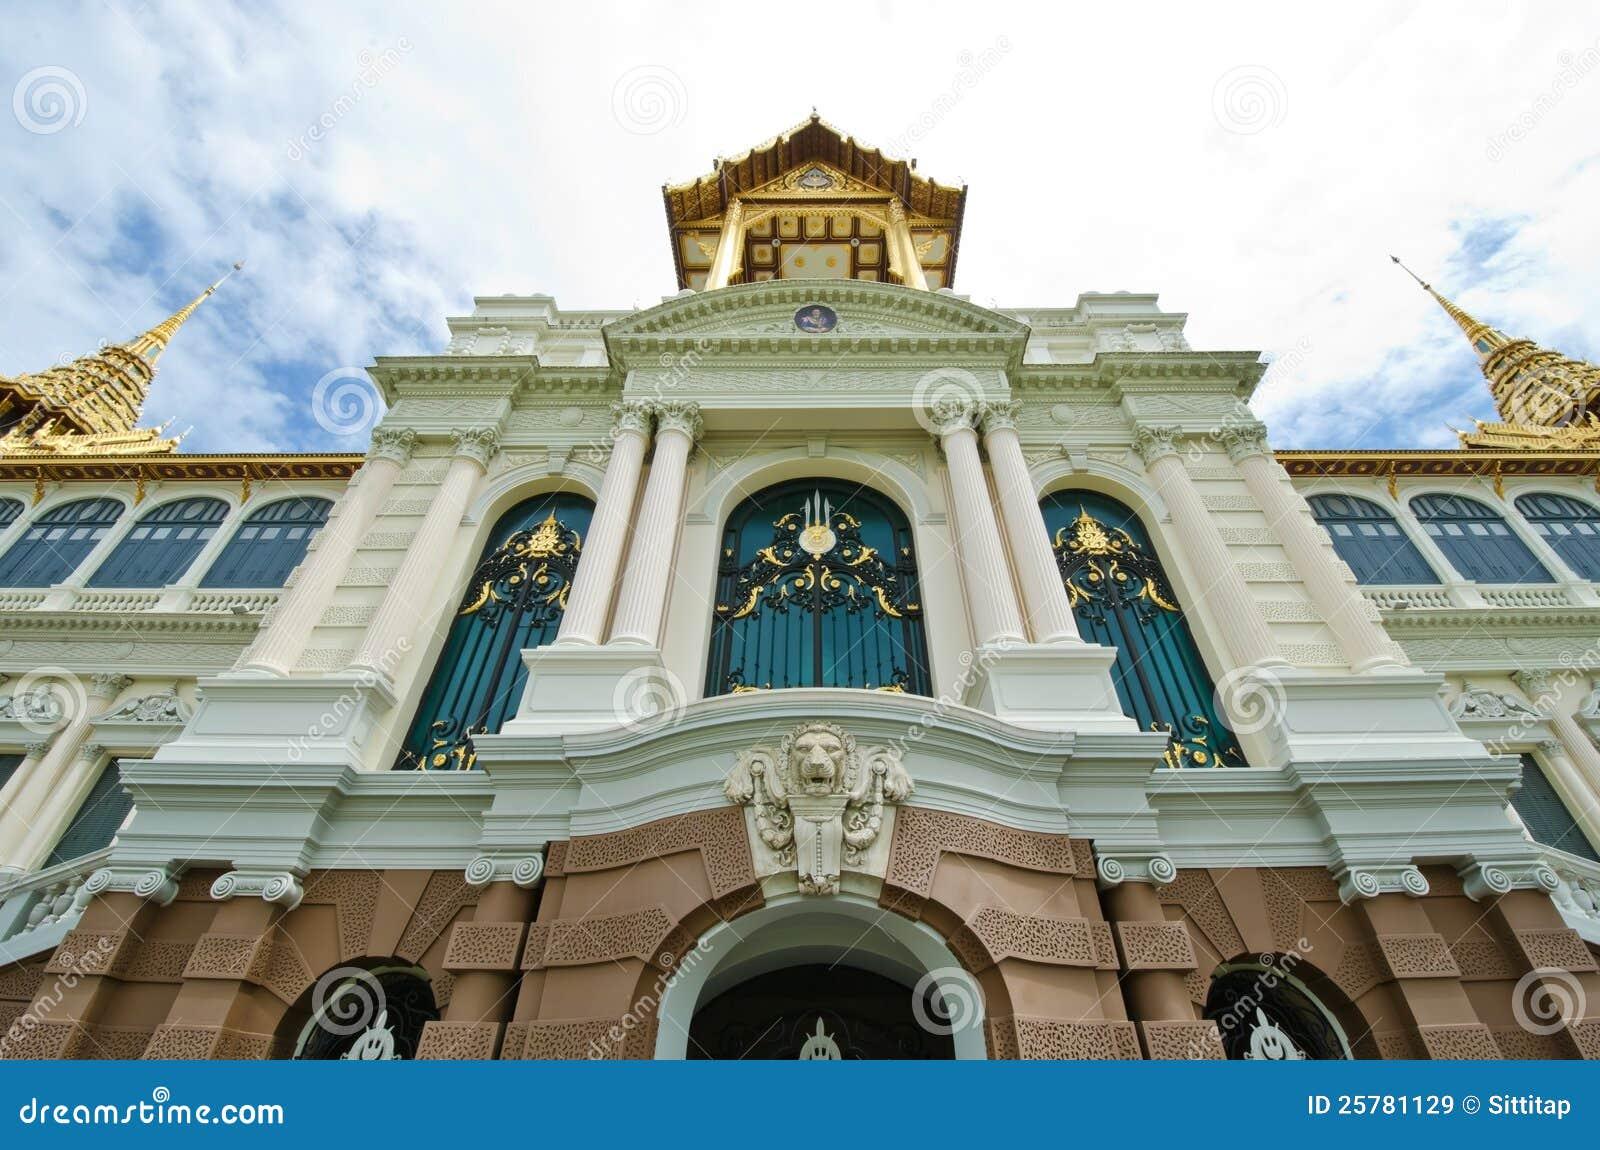 The Chakri Maha Prasat Throne Hall Royalty Free Stock ...